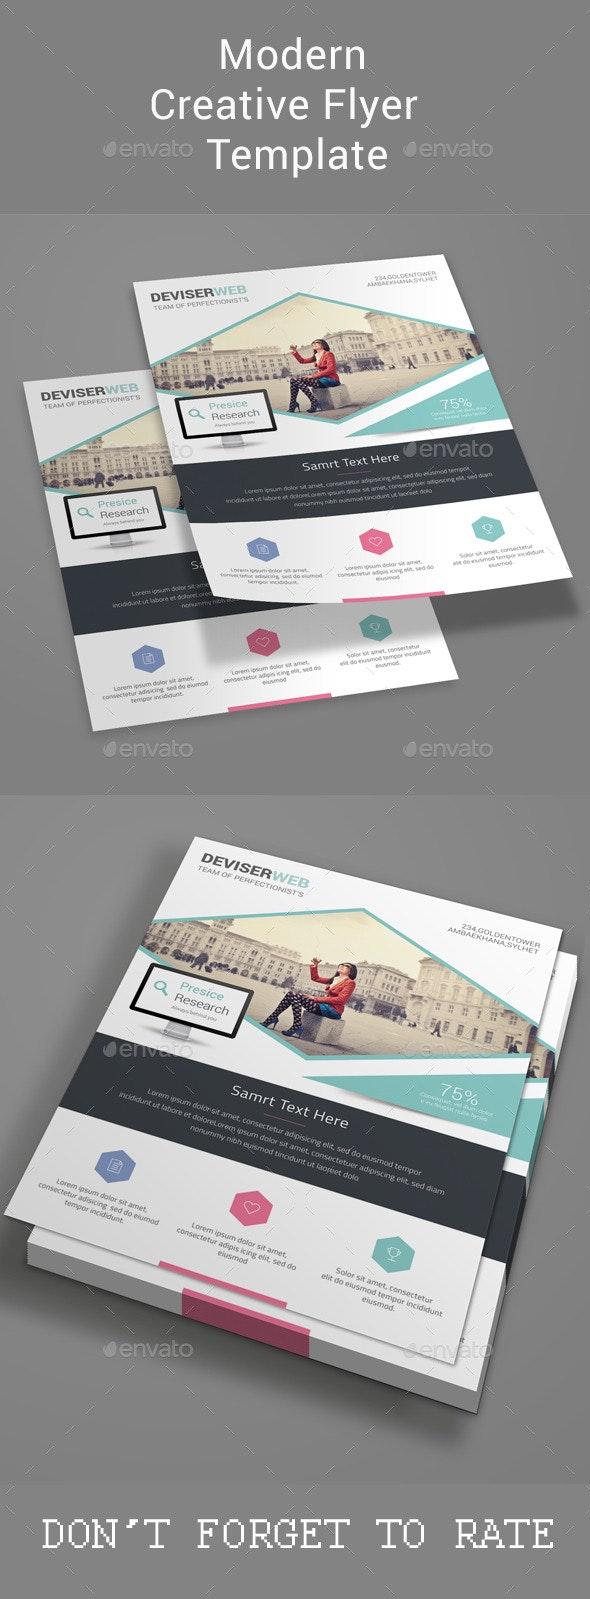 Modern Creative Flyer Template - Corporate Flyers